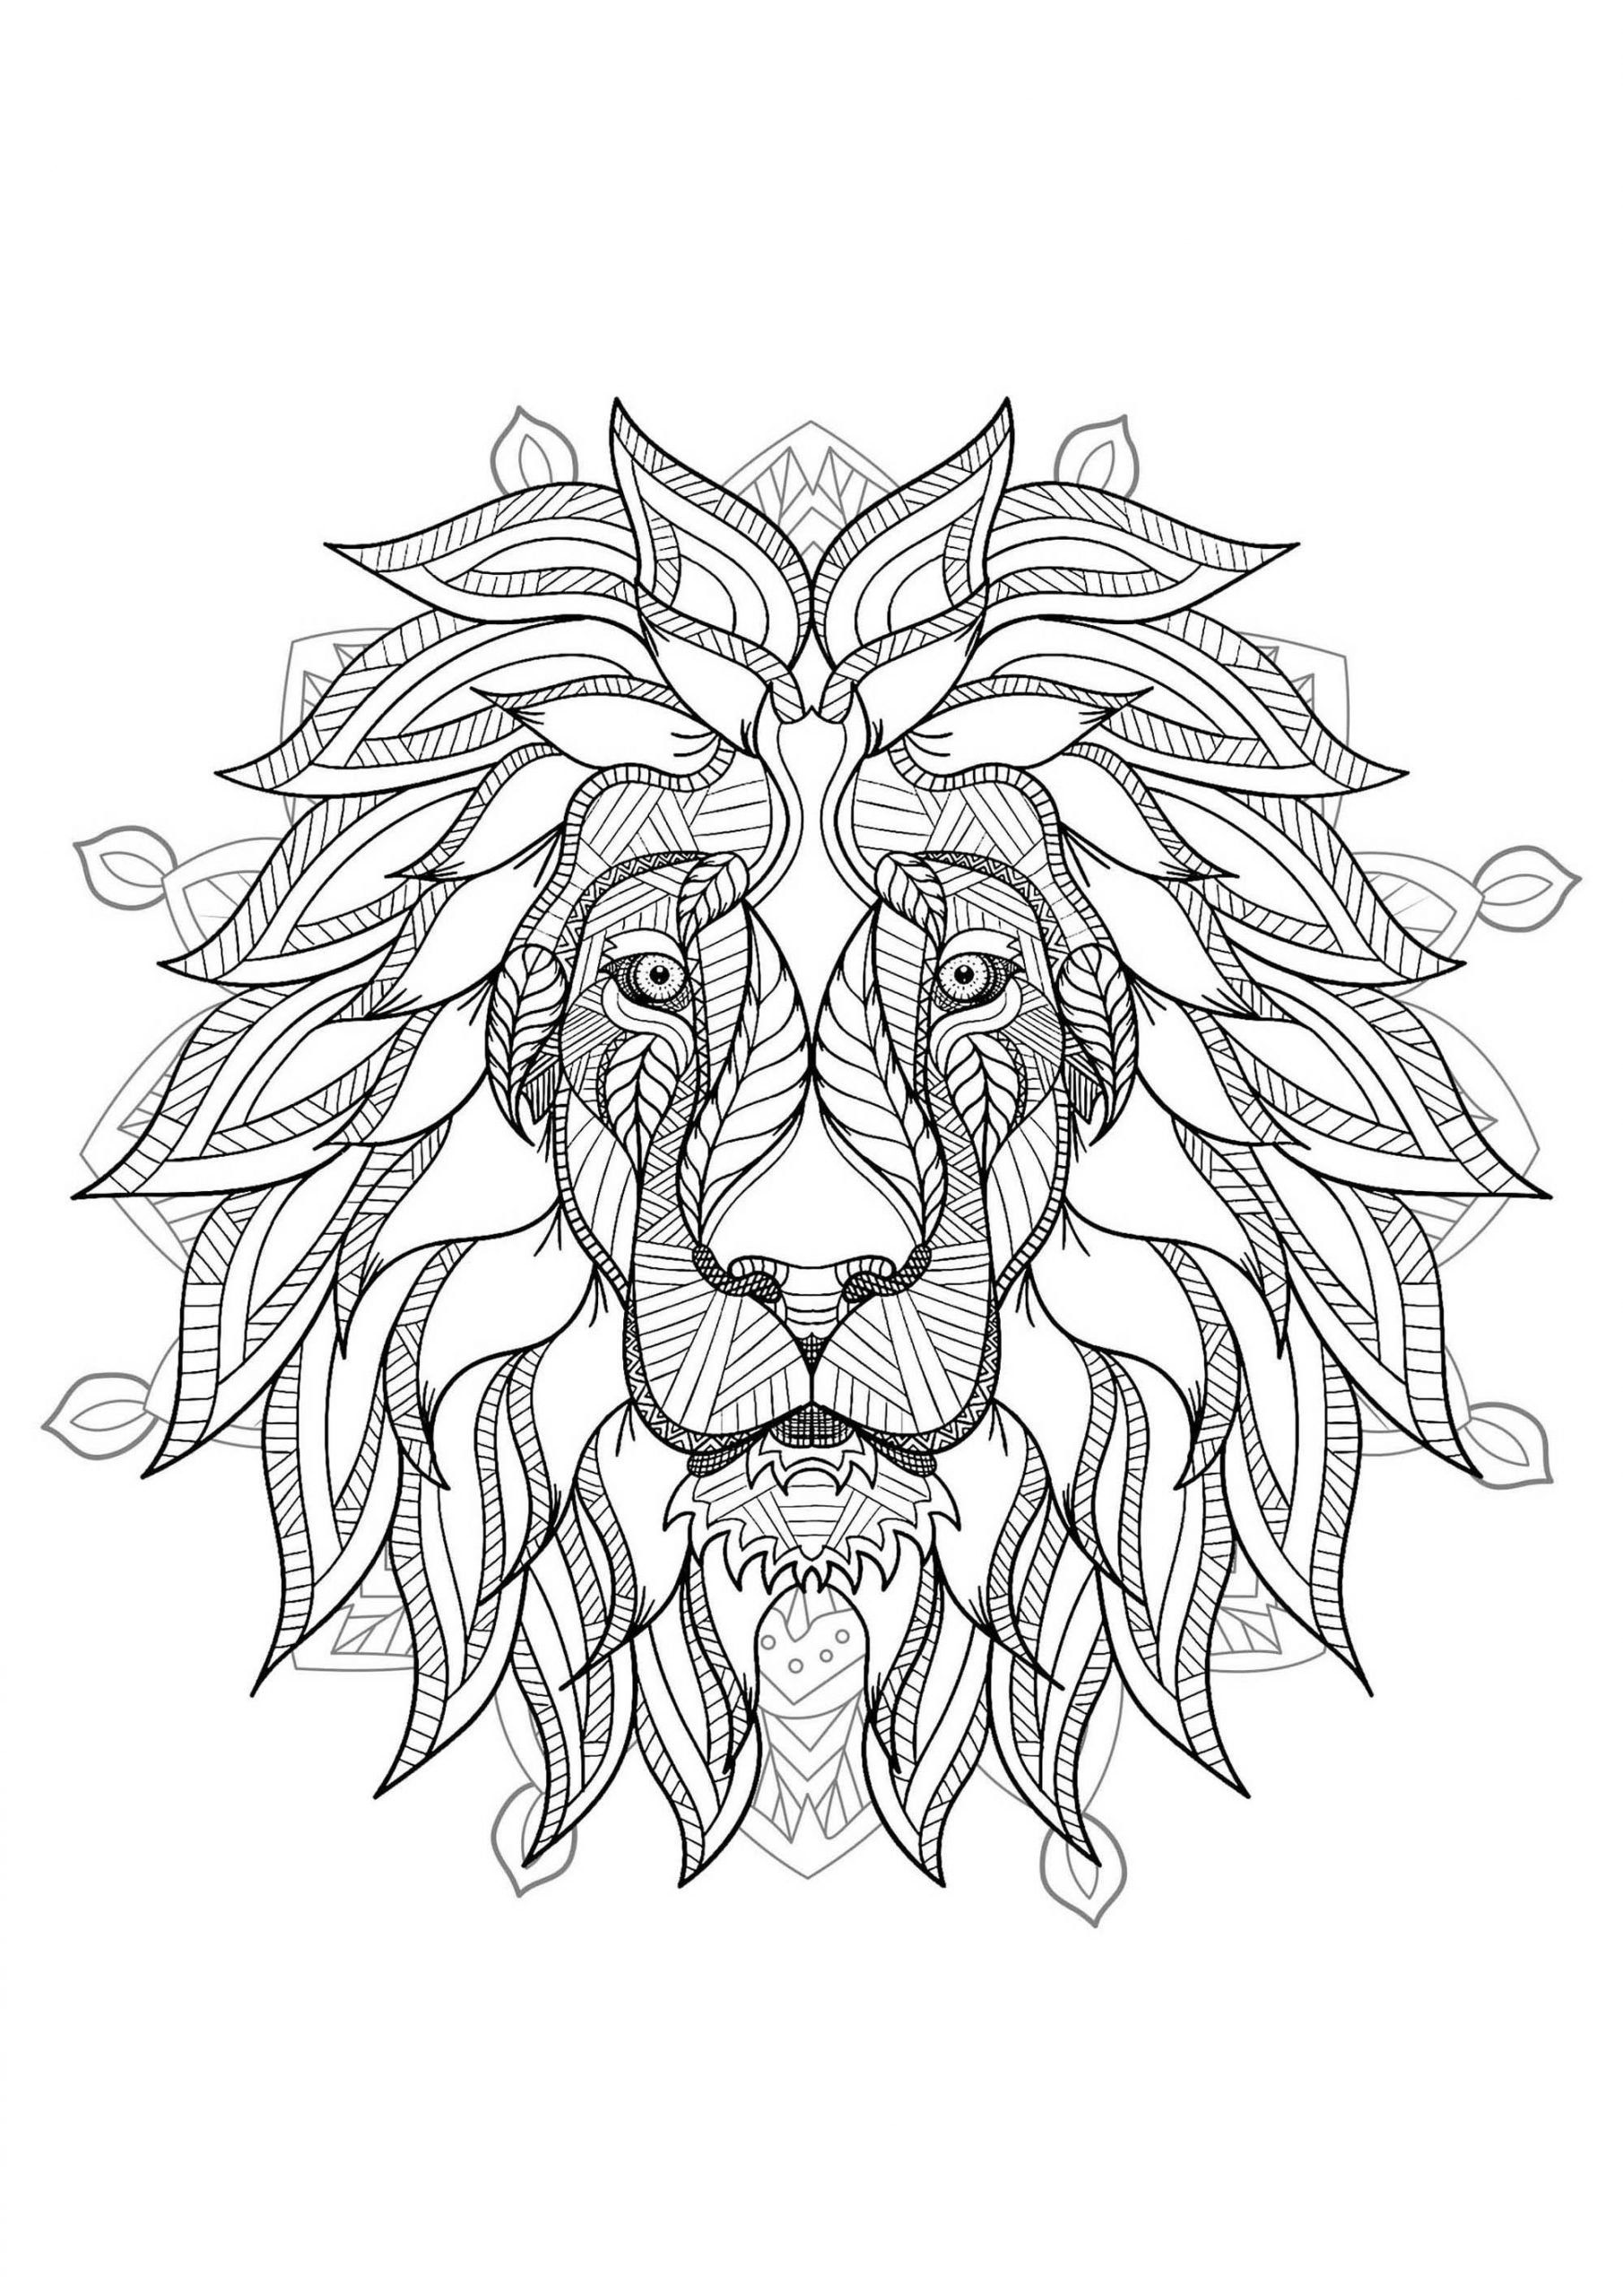 Lion Mandala Coloring Pages Plex Mandala Coloring Page With Majestic Lion Head 2 Lion Coloring Pages Mandala Coloring Pages Geometric Lion